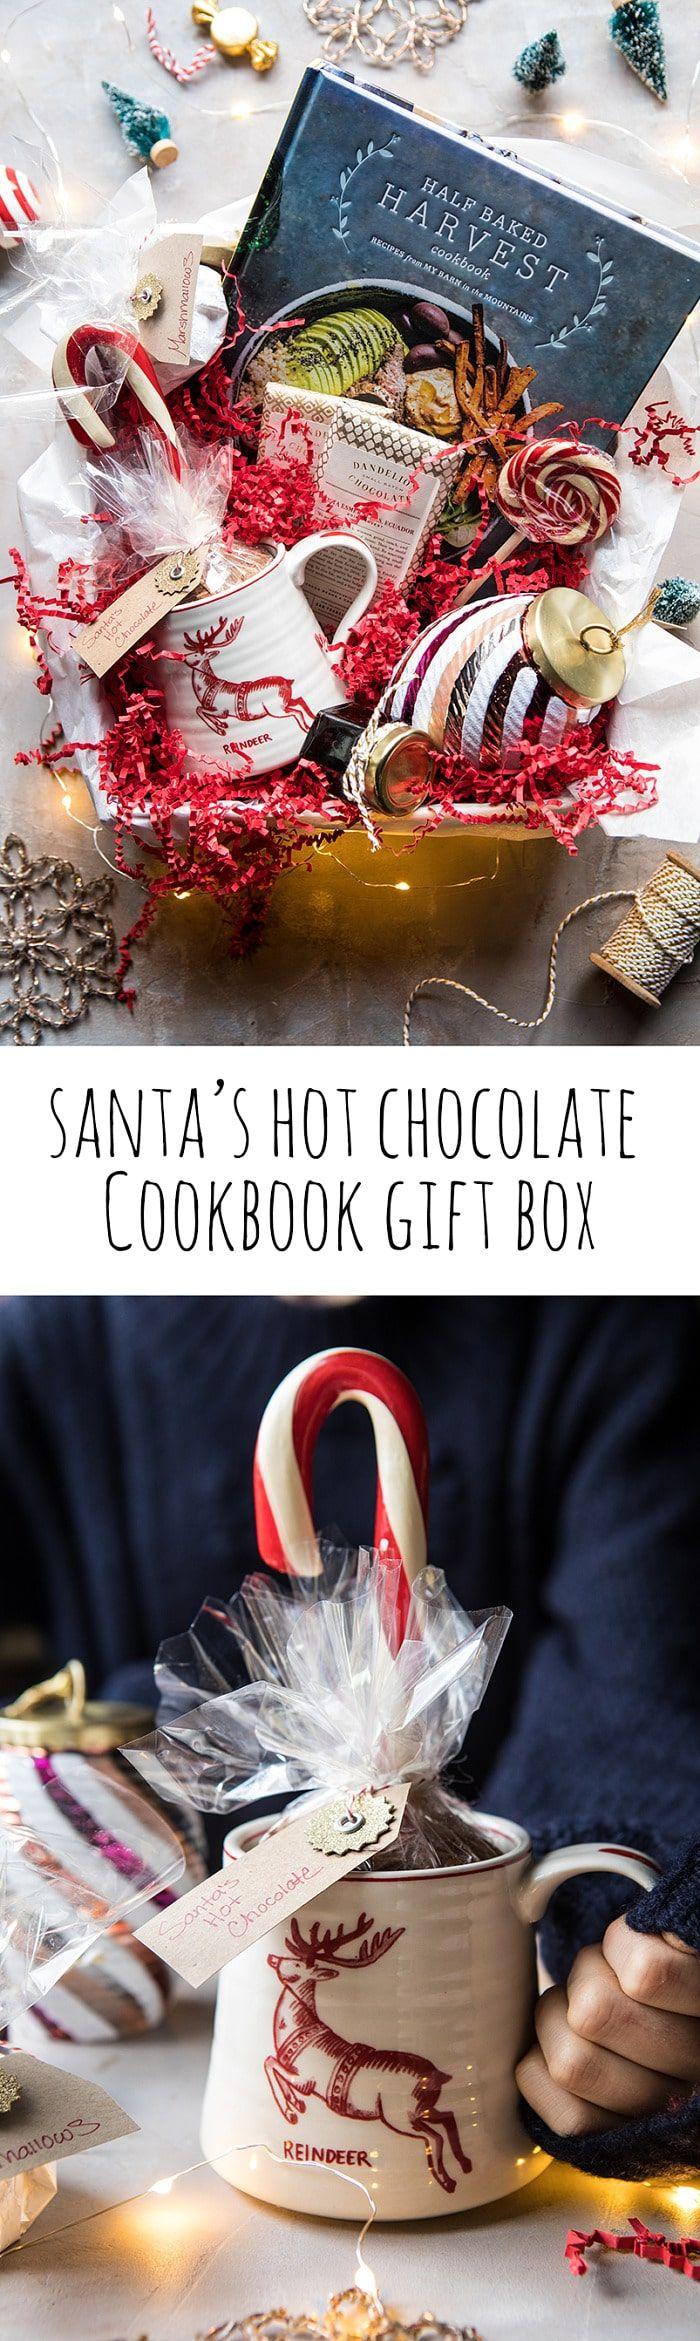 Santa's Hot Chocolate Cookbook Gift Box   halfbakedharvest.com @hbharvest